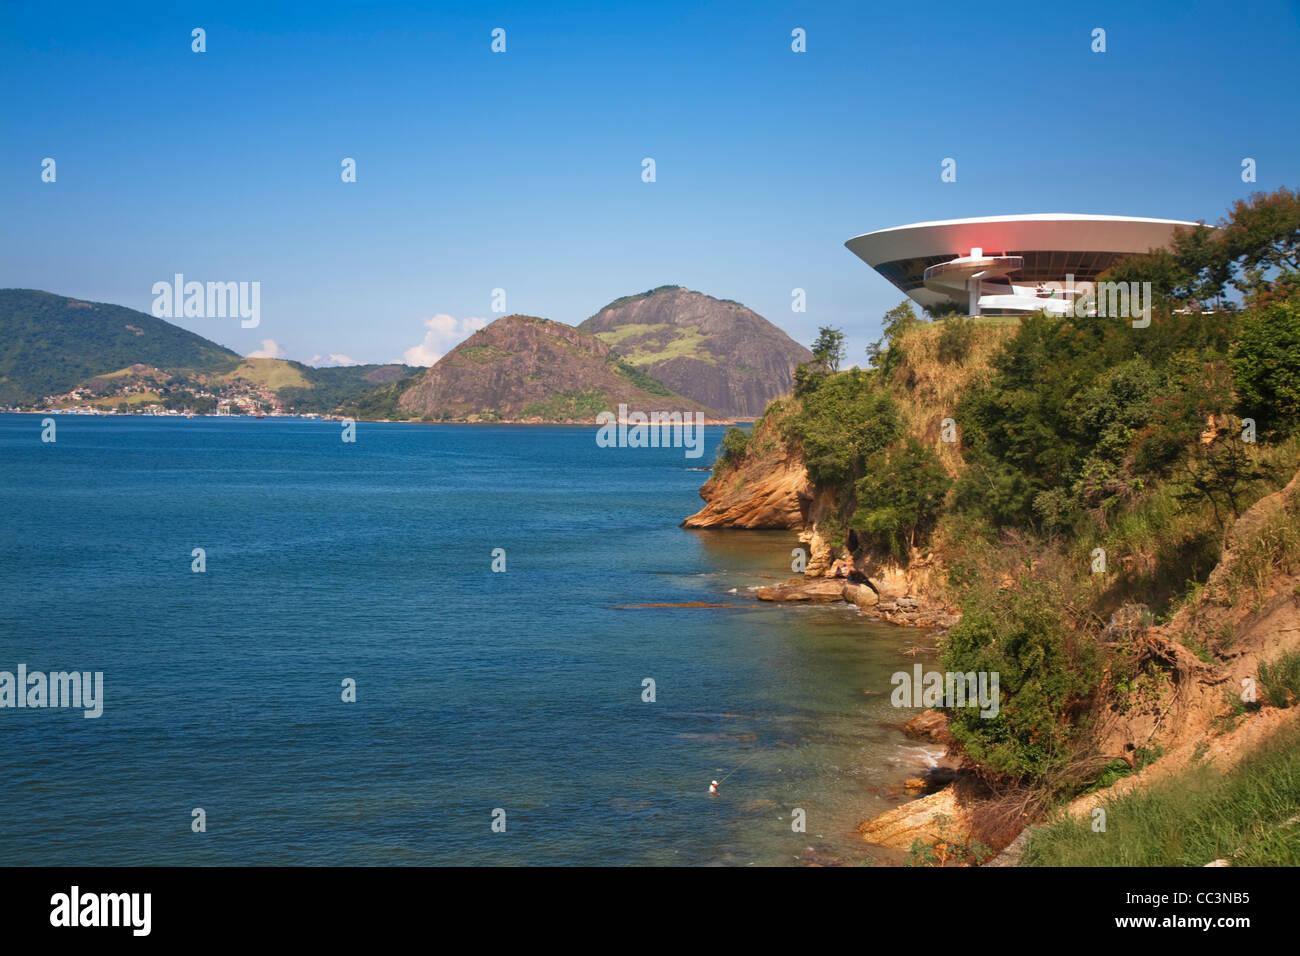 Brazil, Rio De Janeiro, Niteroi, Modern Art musuem designed by arcitect Oscar Niemeyer - Stock Image